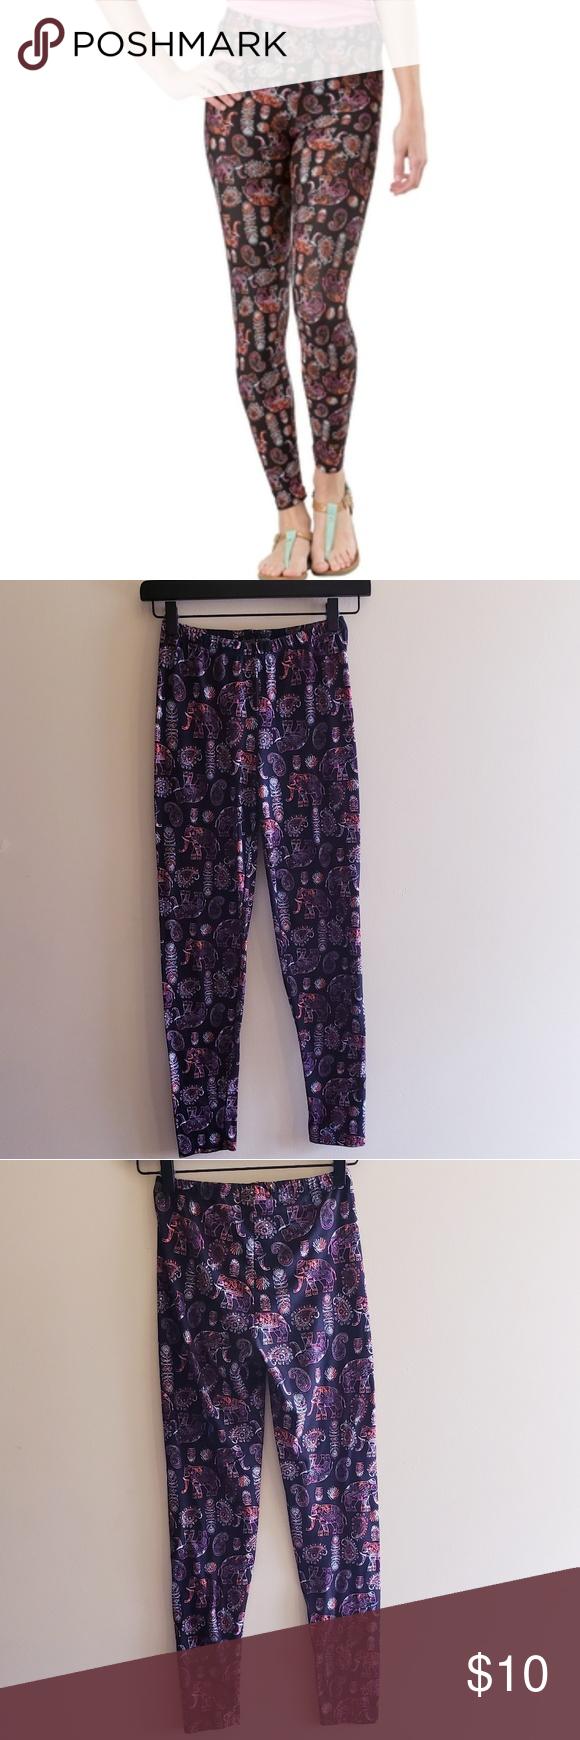 1c458e5b40579 Derek Heart Juniors Printed Yummy Leggings ▫Boho elephant print ▫Elastic  Waistband ▫So soft! ▫pre owned, great condition! Make an offer or bundle to  ...